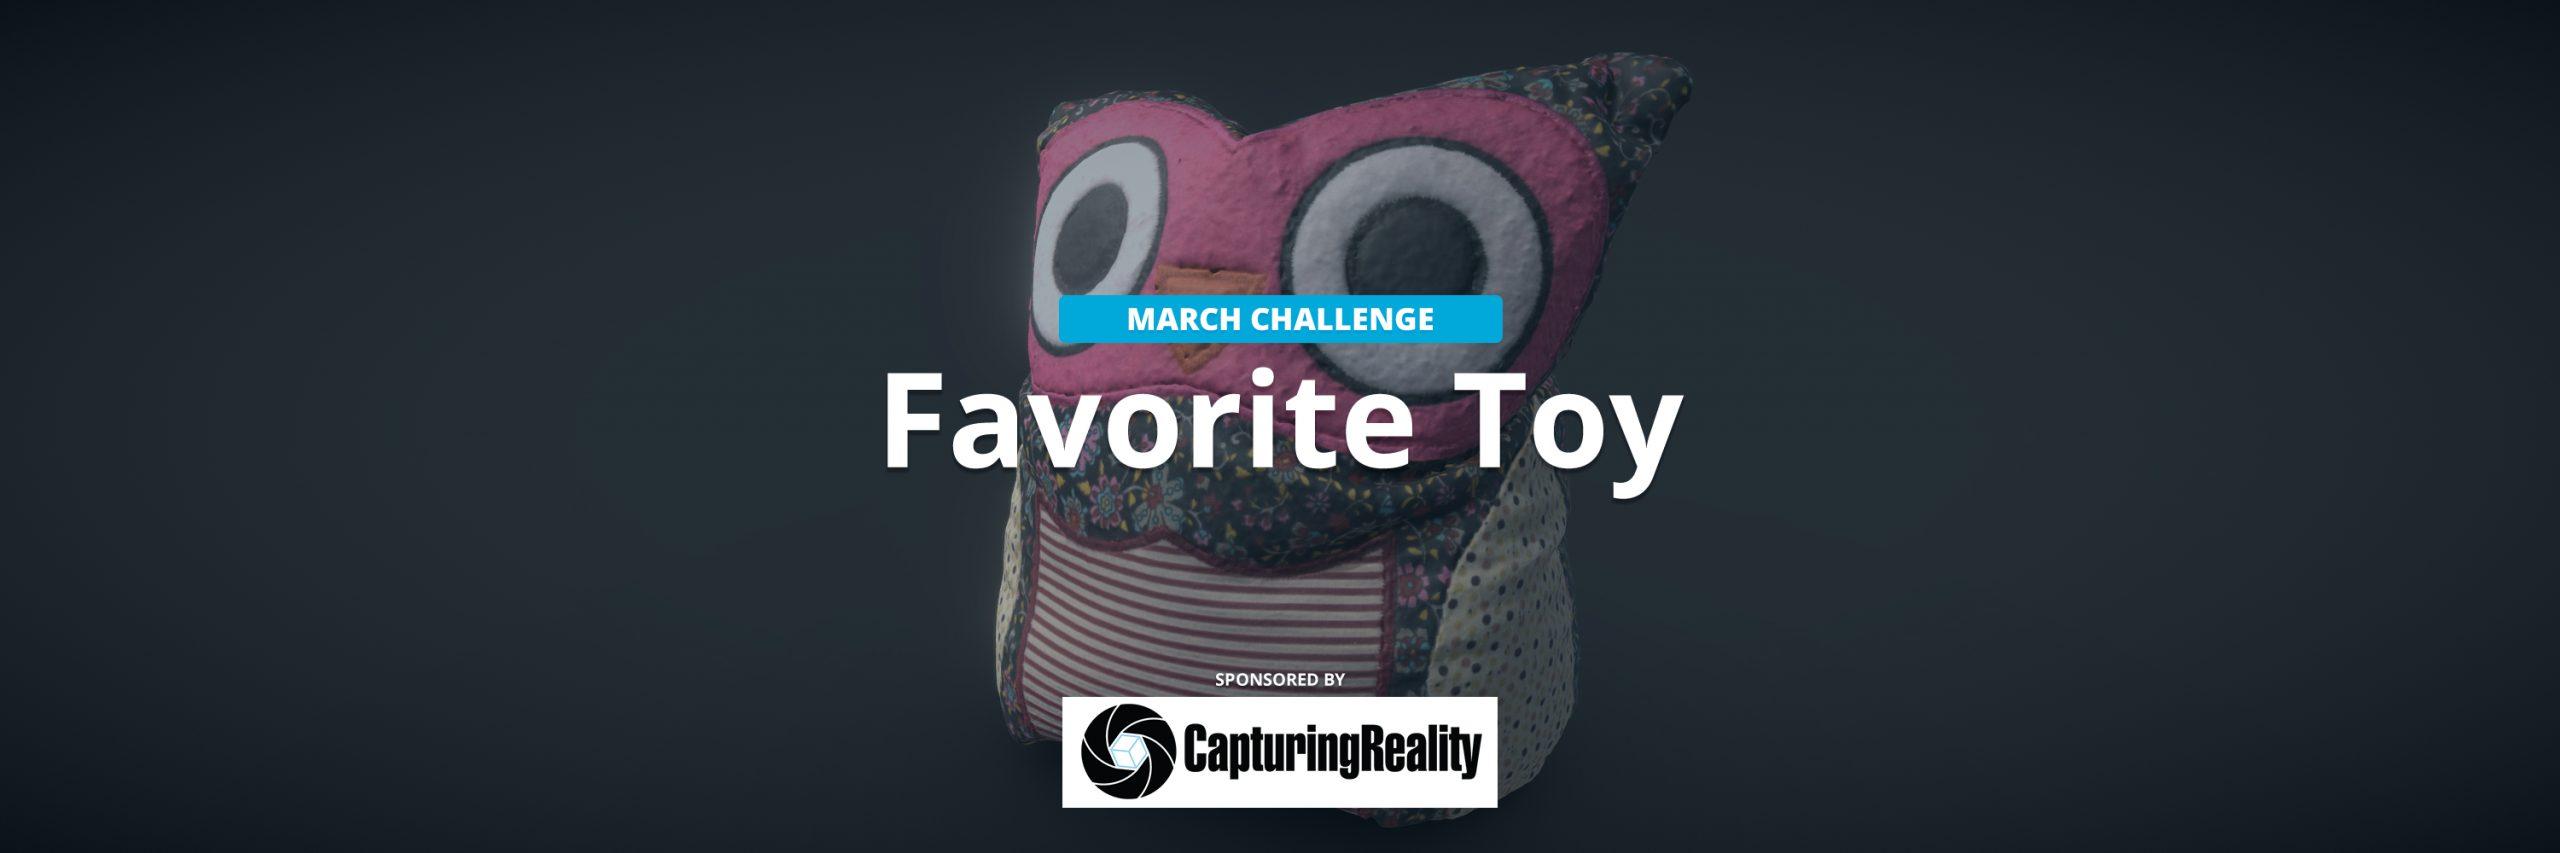 realitycapture toy scanning challenge